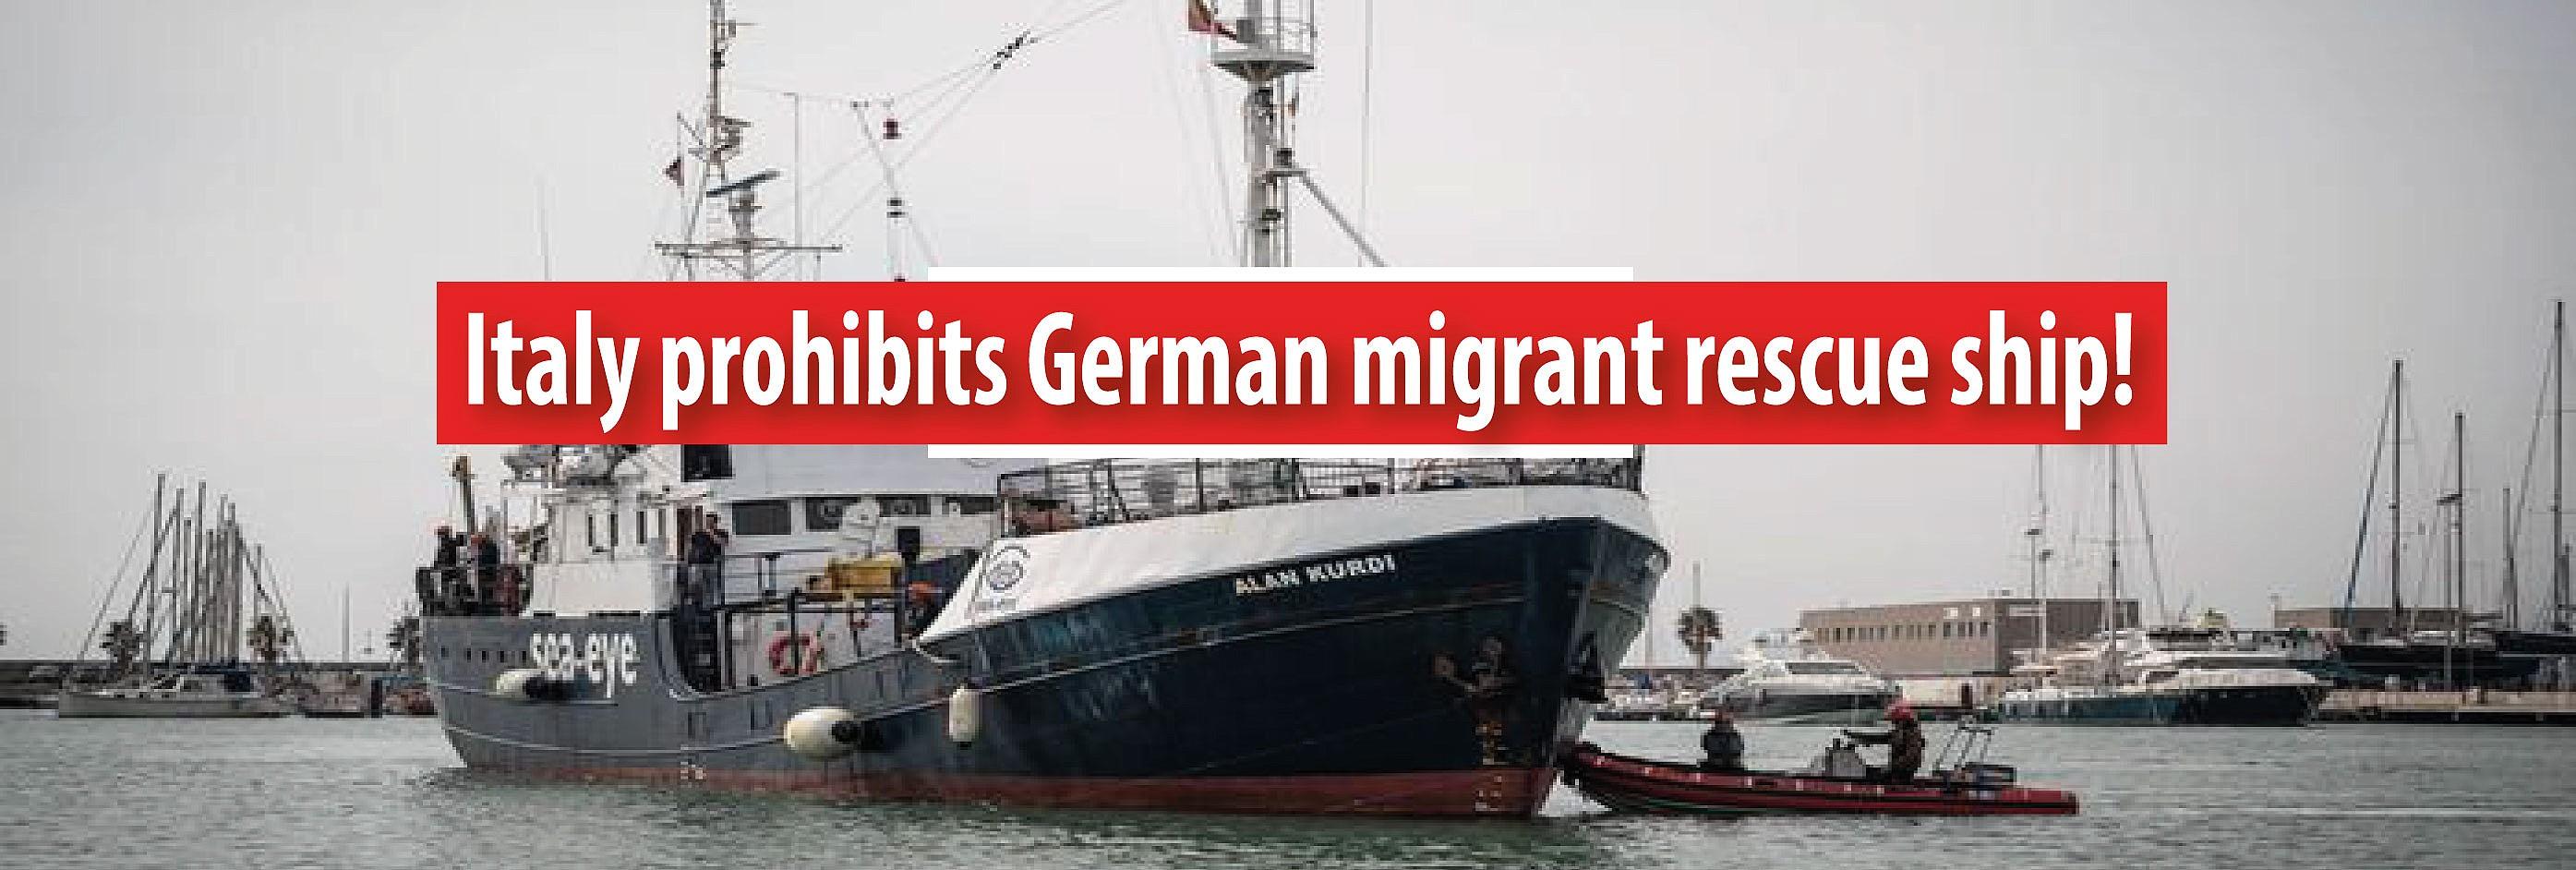 Italy prohibits German migrant rescue ship!